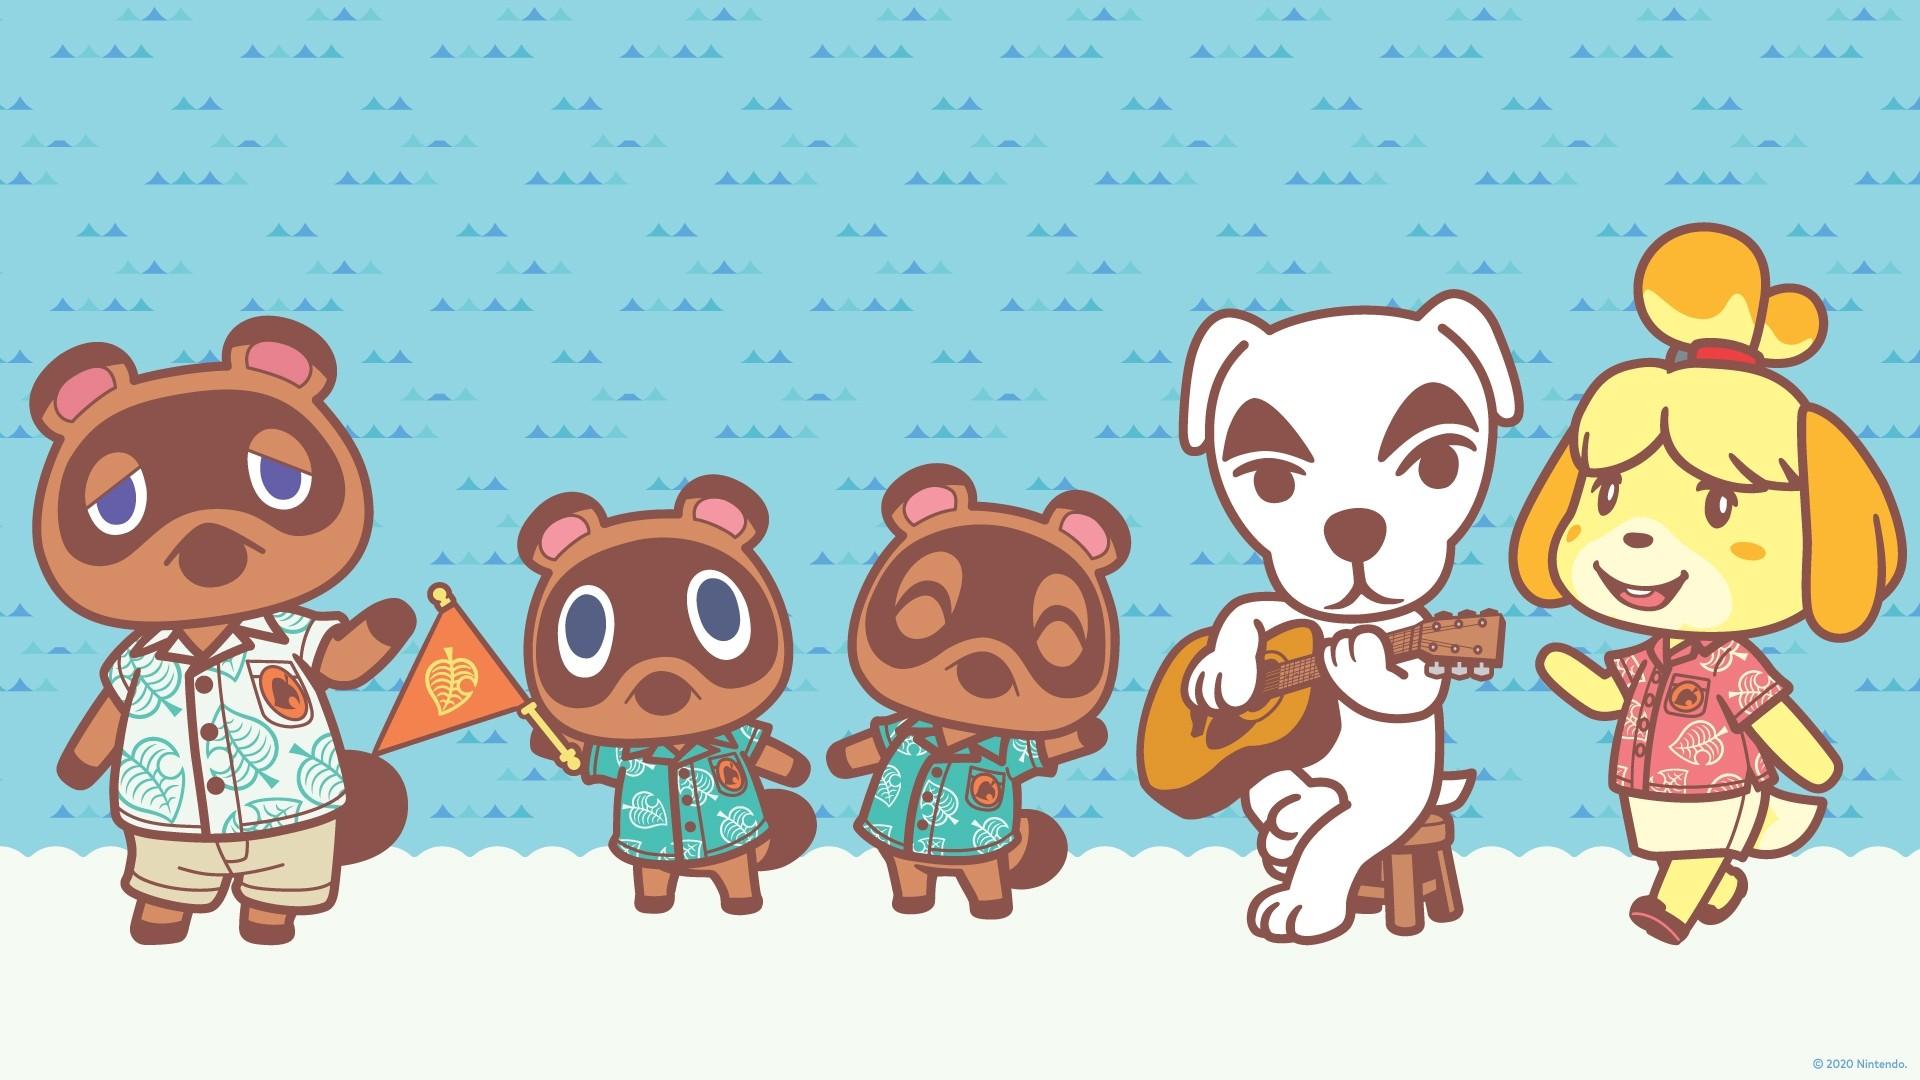 Animal Crossing High Quality